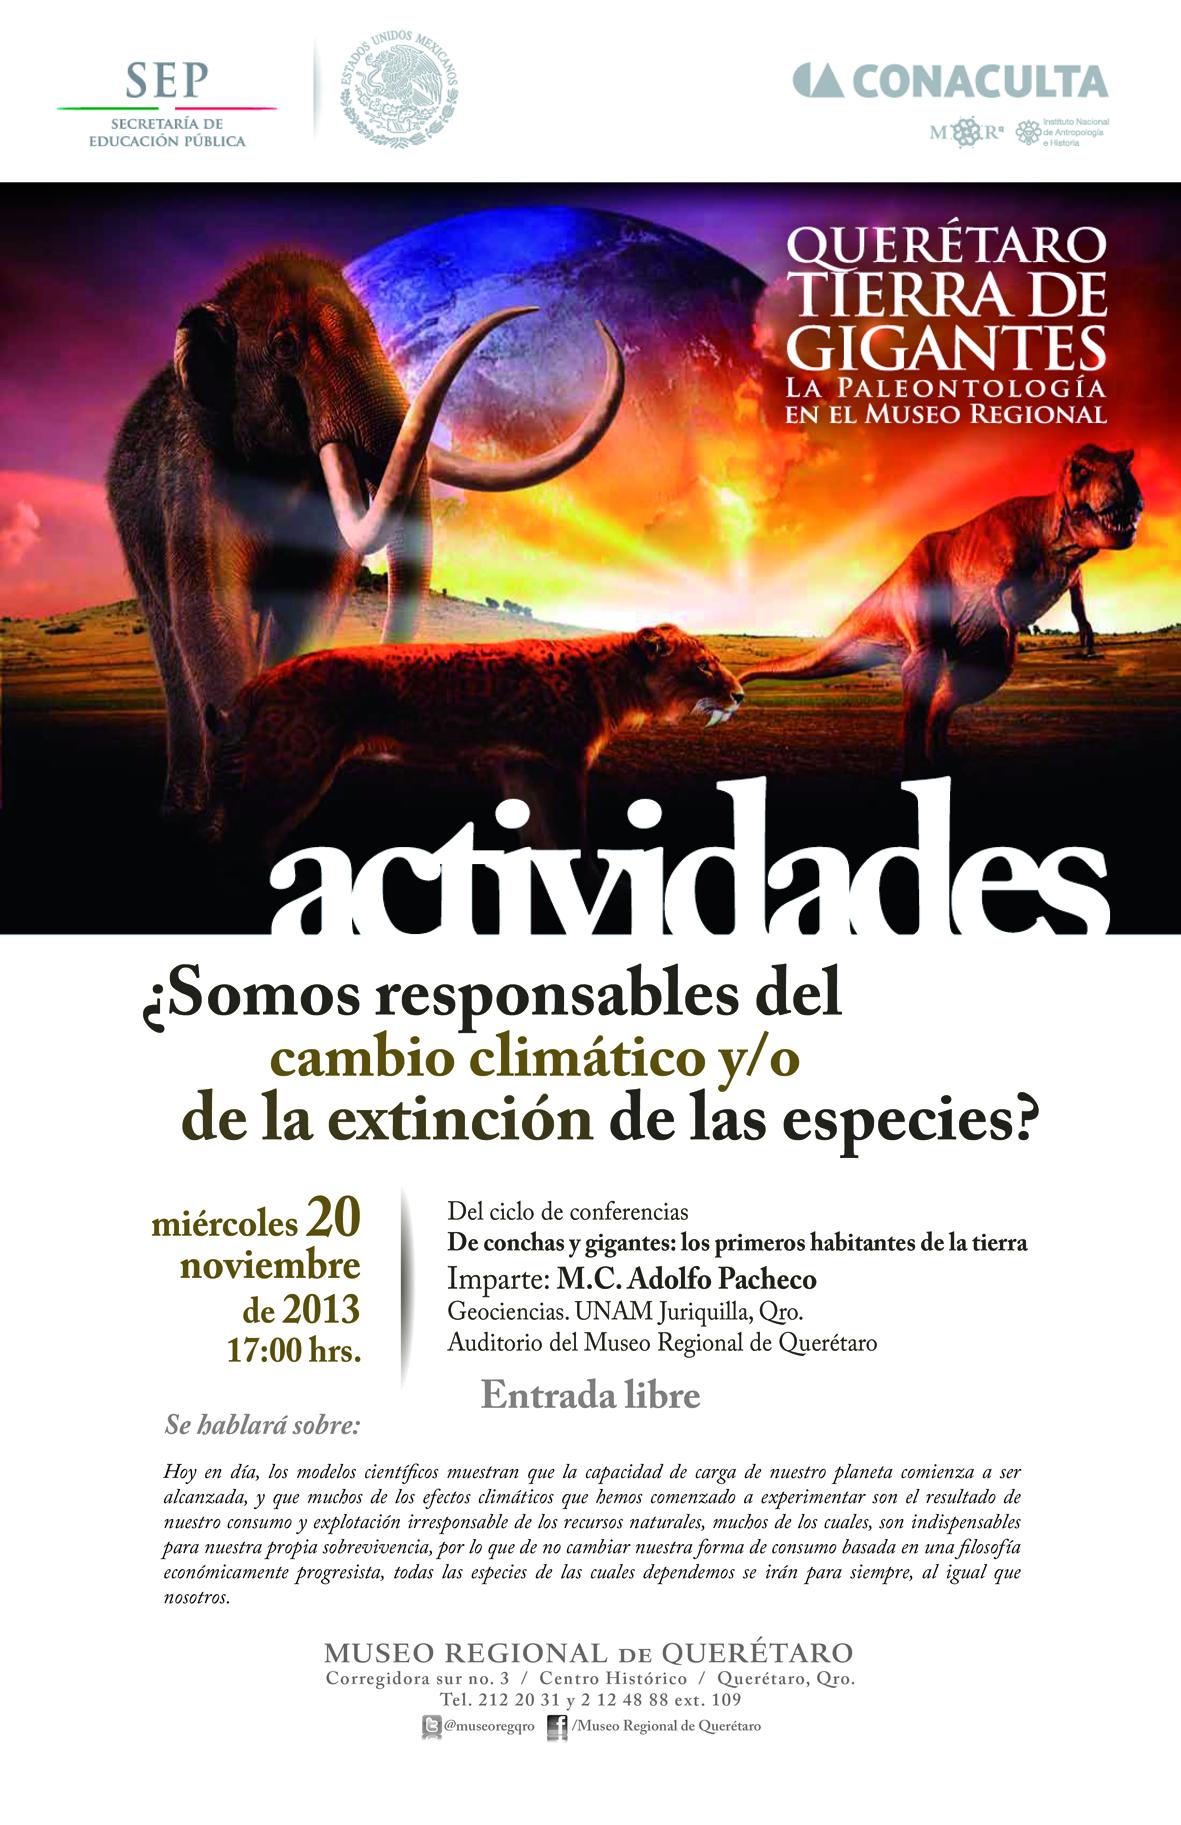 Querétaro Tierra de Gigantes – ¿Somos responsables del cambio climático?